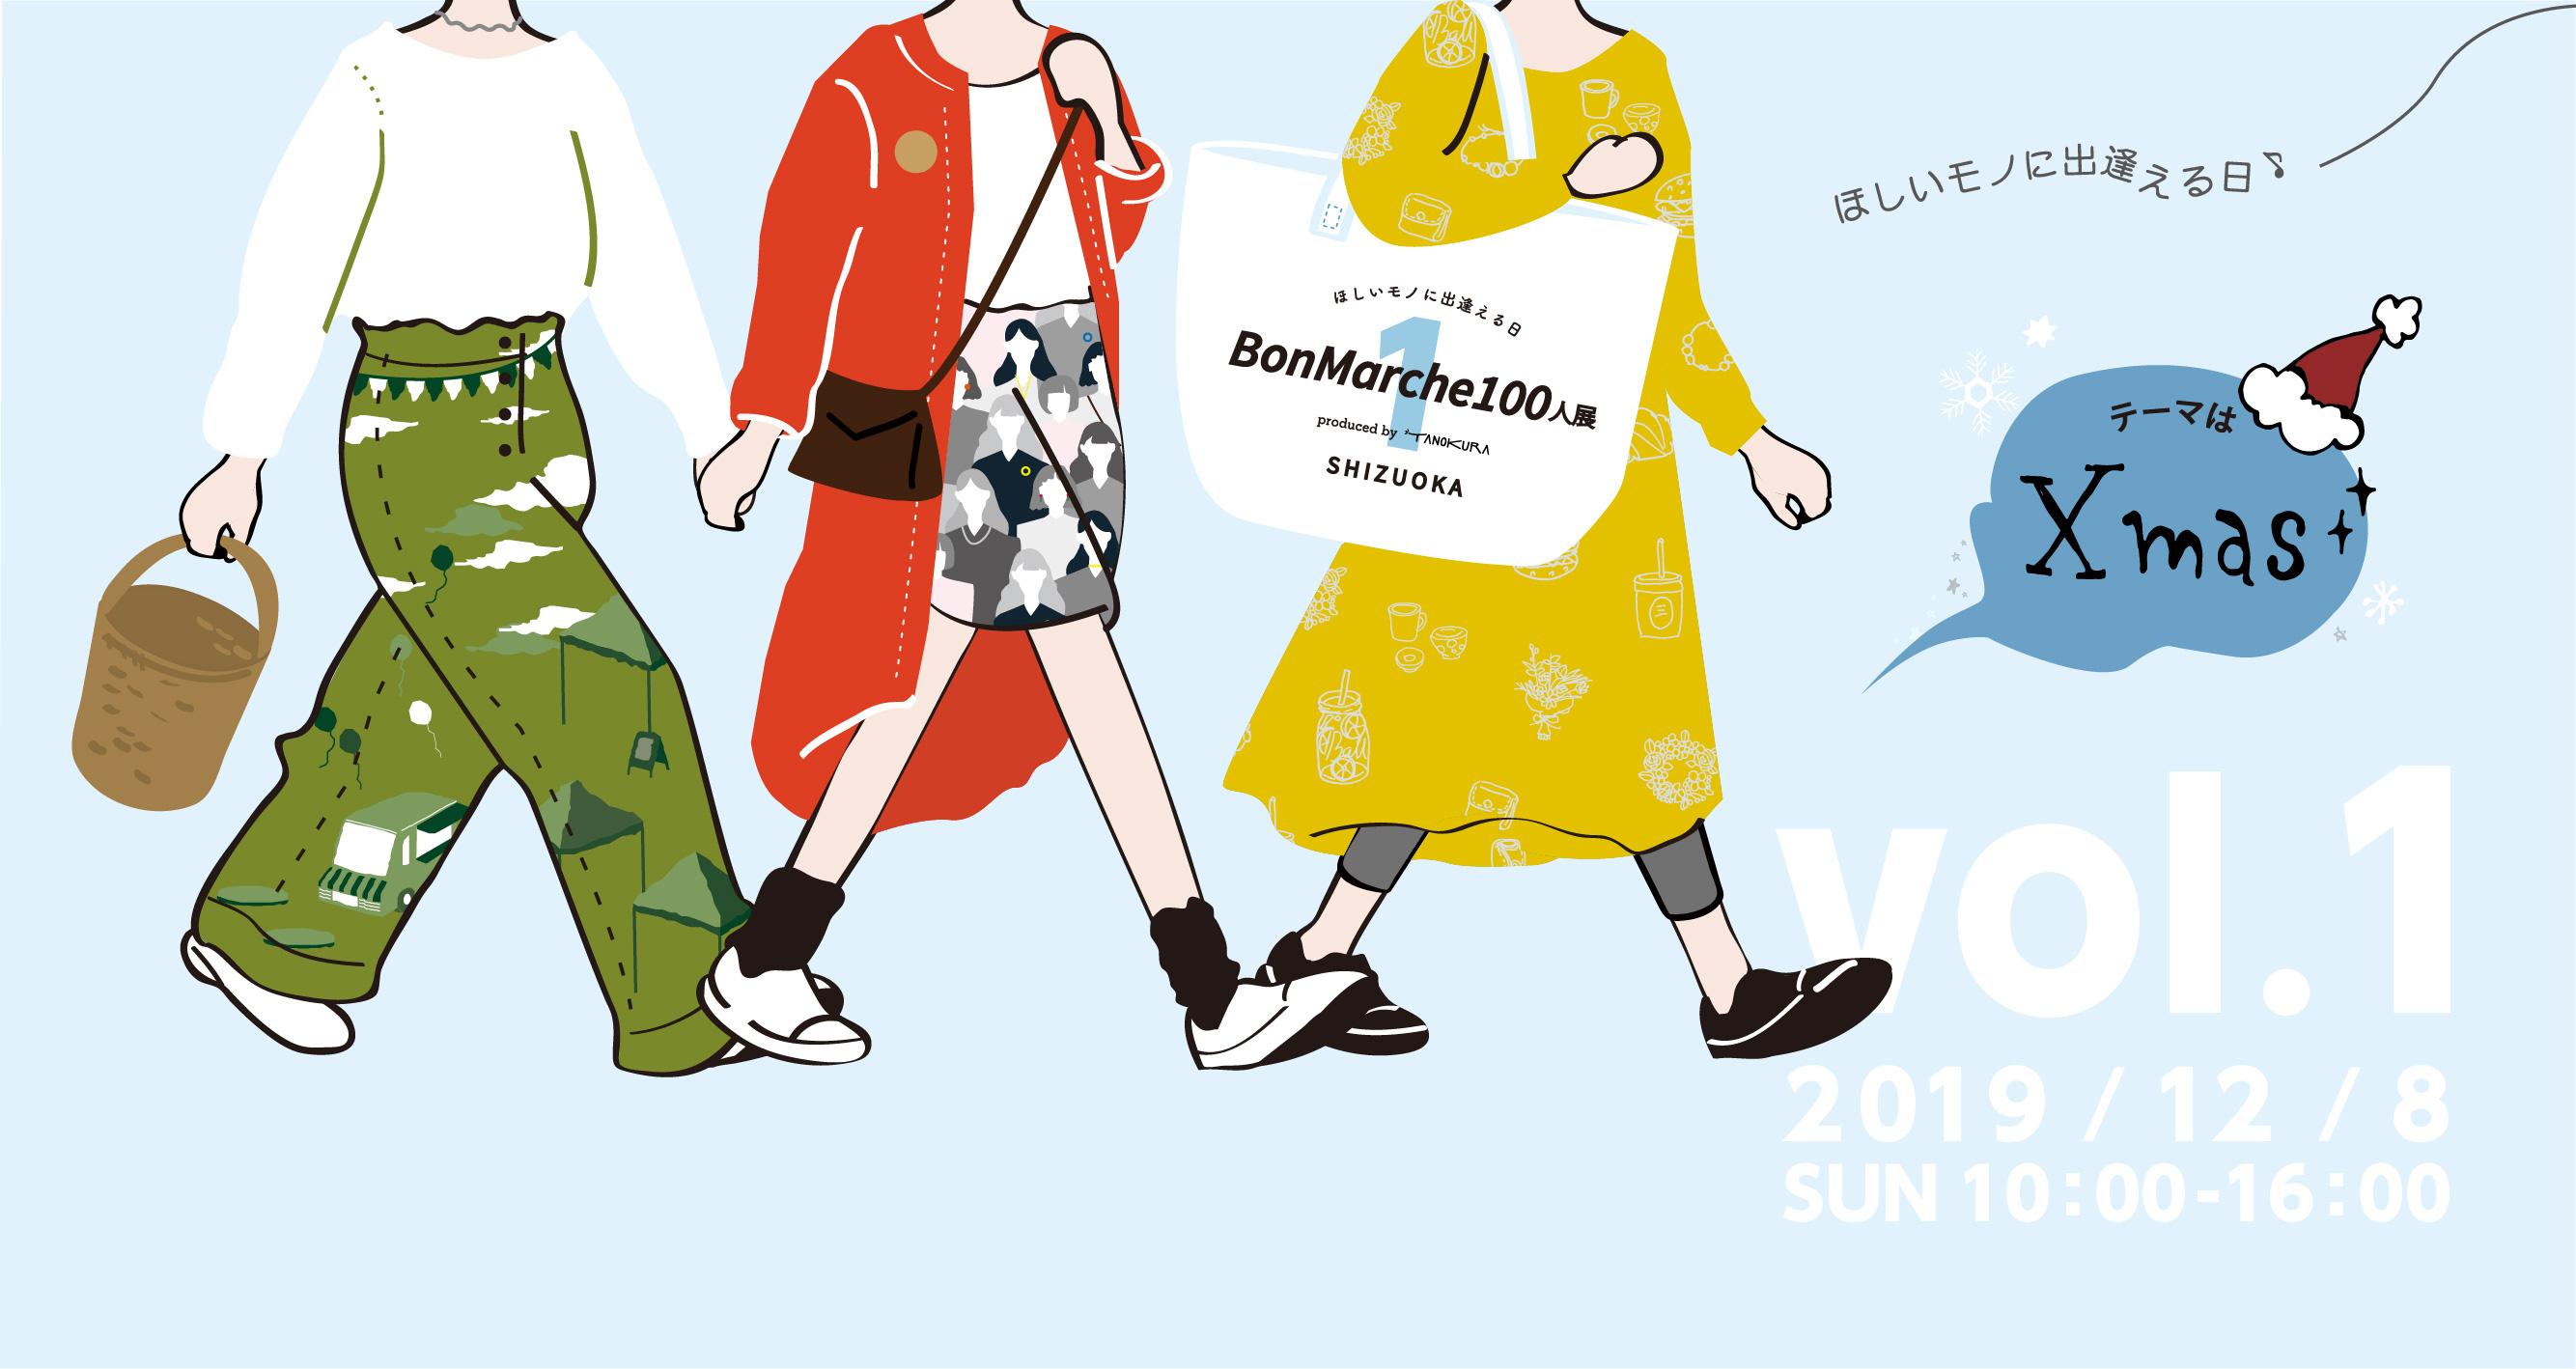 BonMarche100人展in静岡に遊びに行こう!